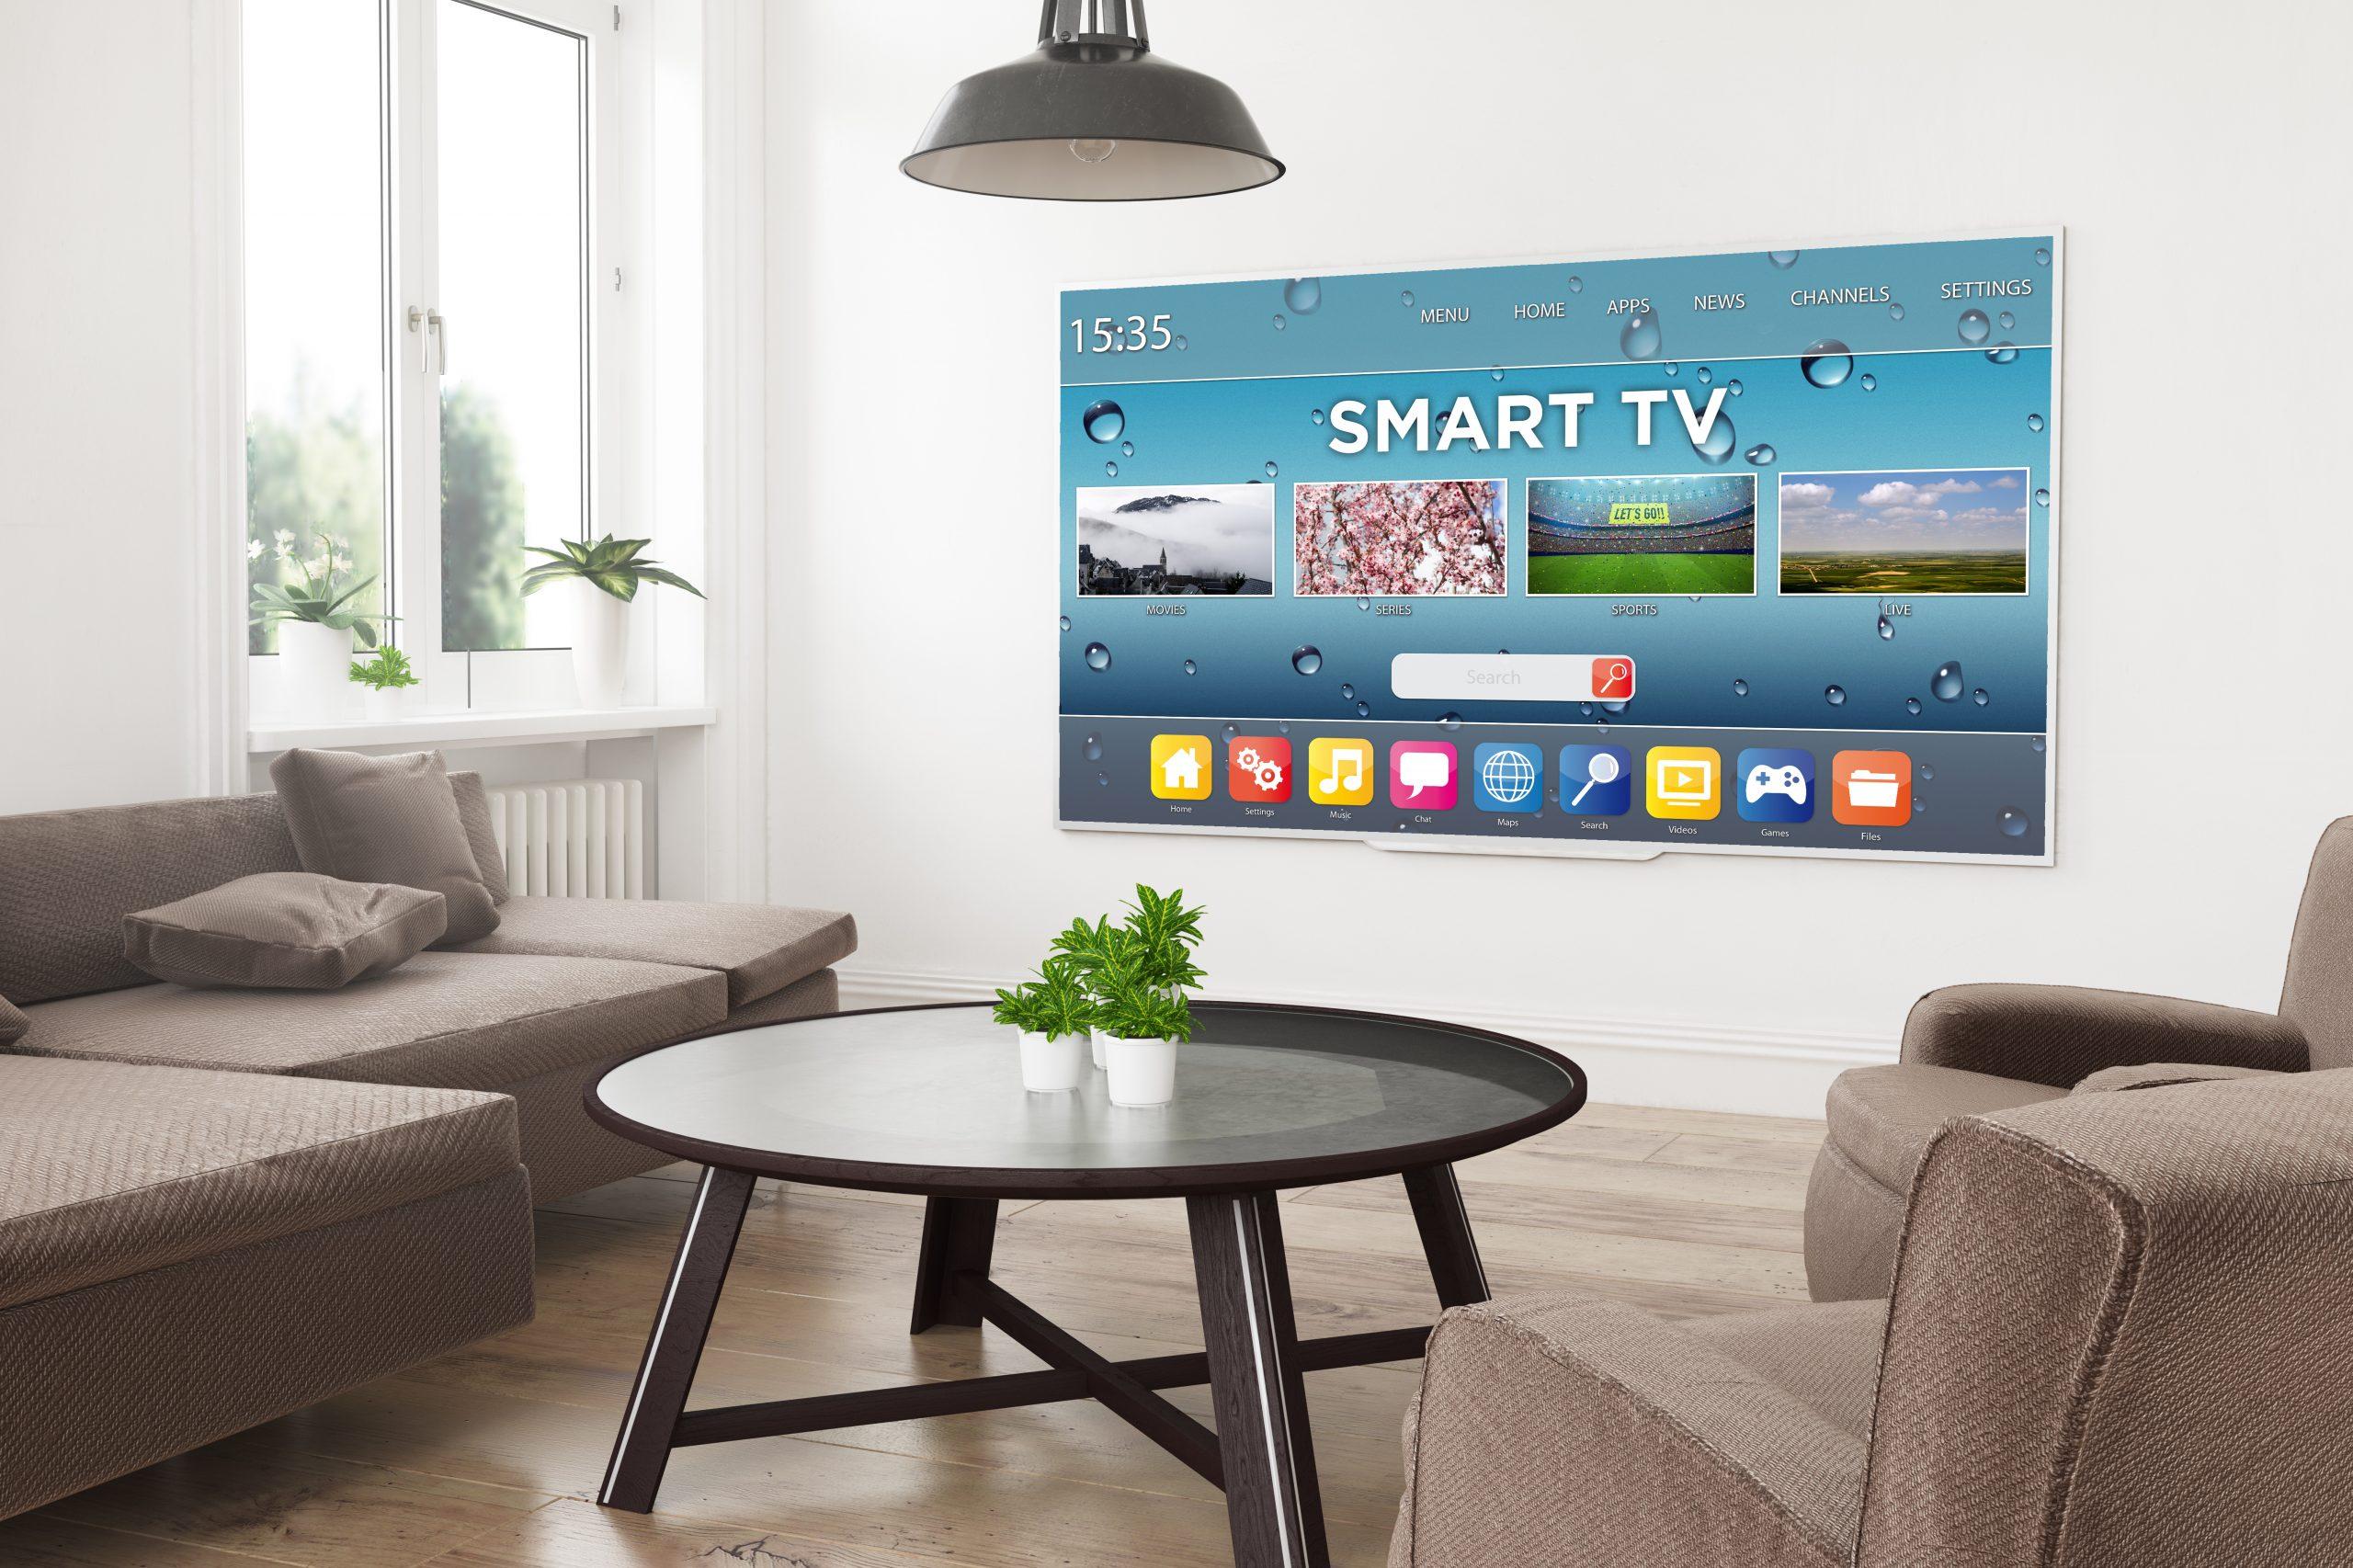 Fibra + Tv + Alarma de seguridad